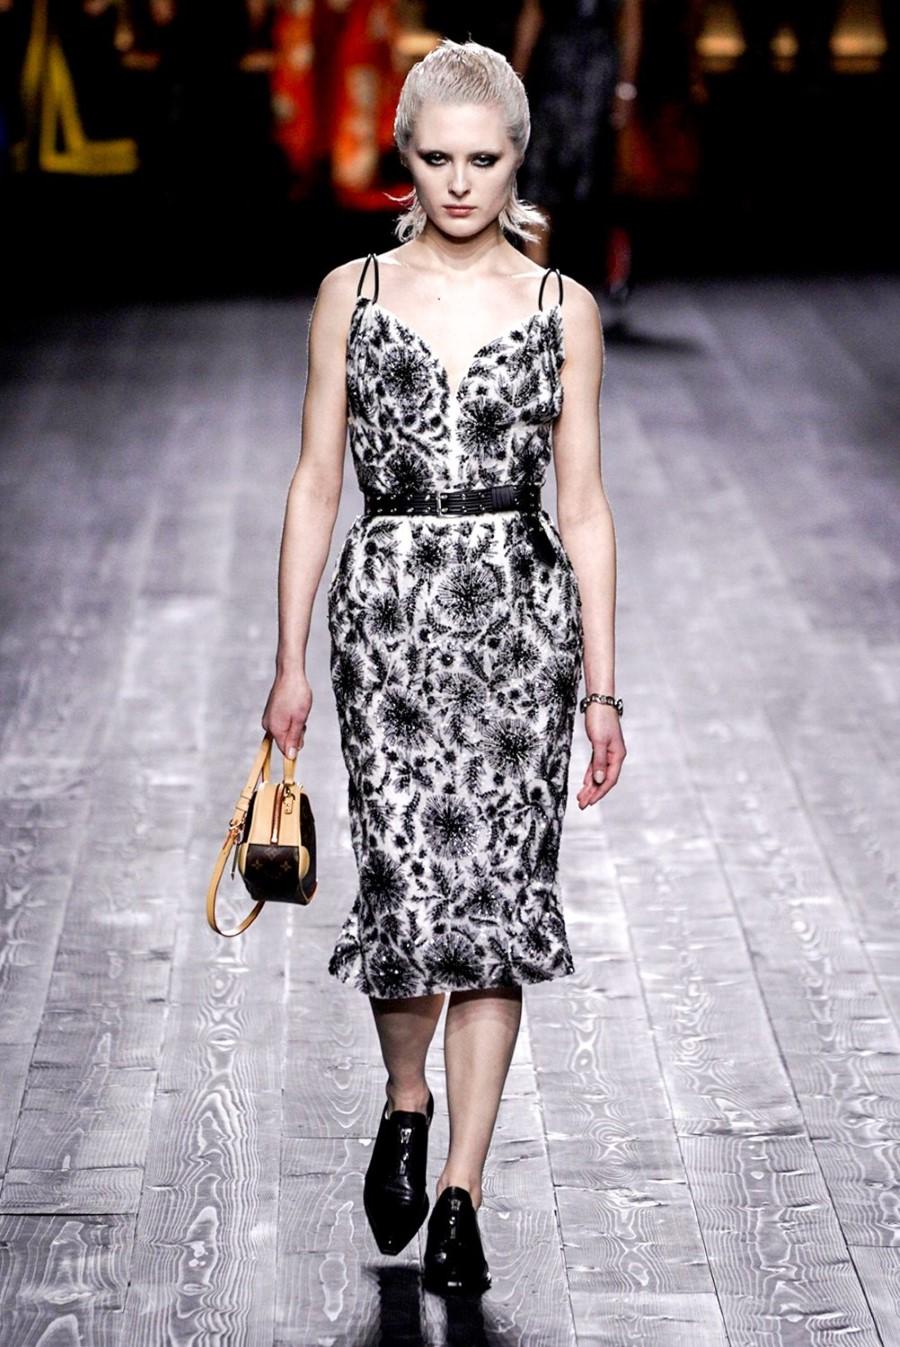 Louis Vuitton - Fall Winter 2020 - Paris Fashion Week